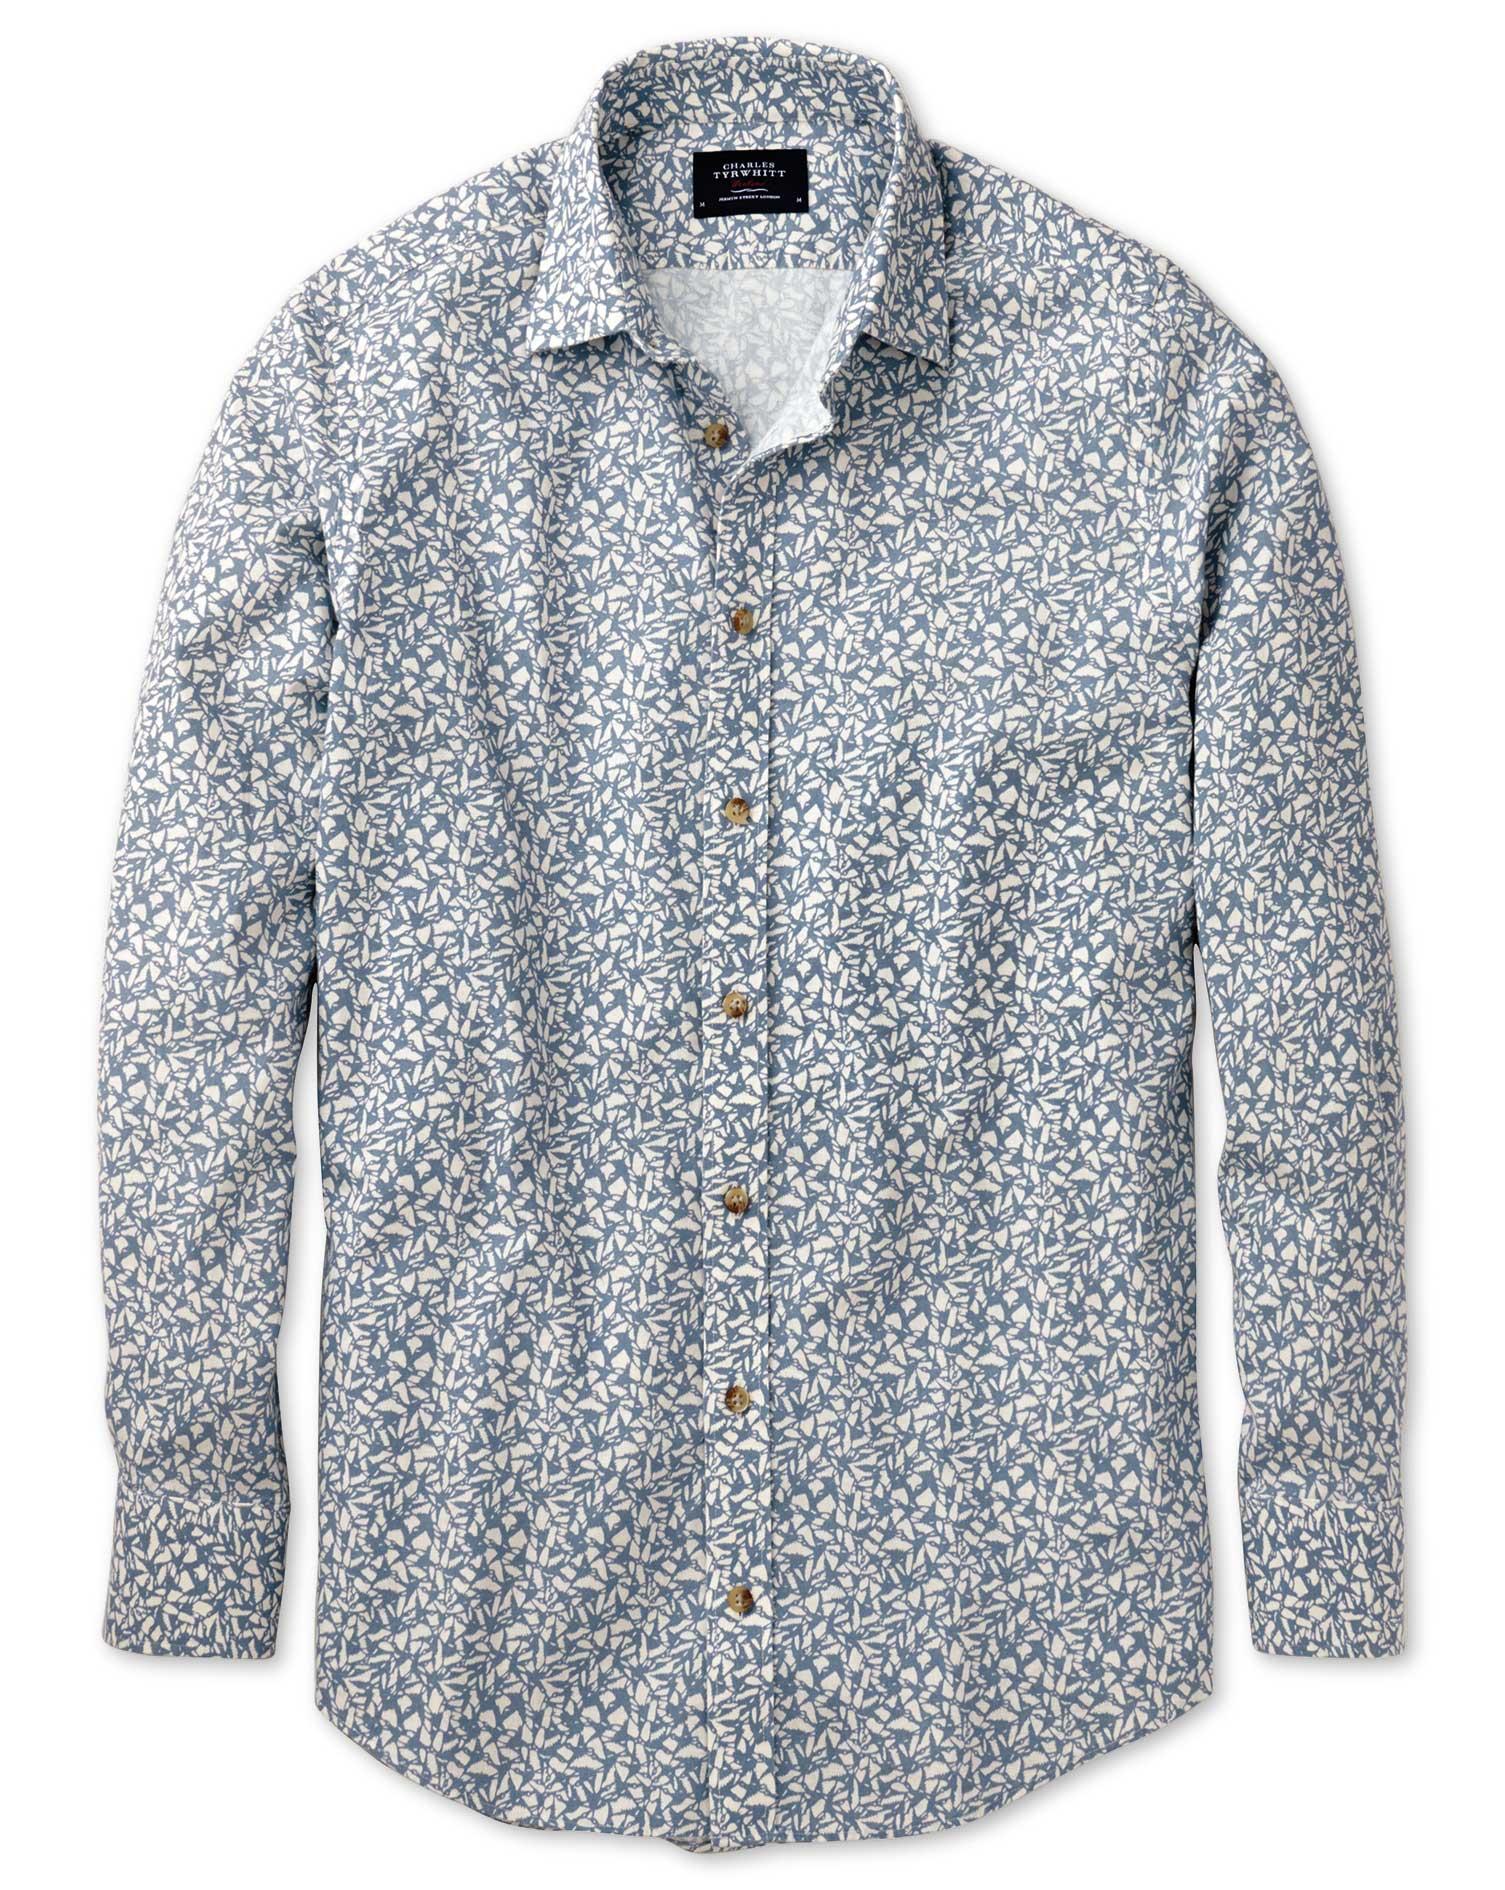 Extra Slim Fit Sky Blue Leaf Print Shirt Single Cuff Size XXL by Charles Tyrwhitt